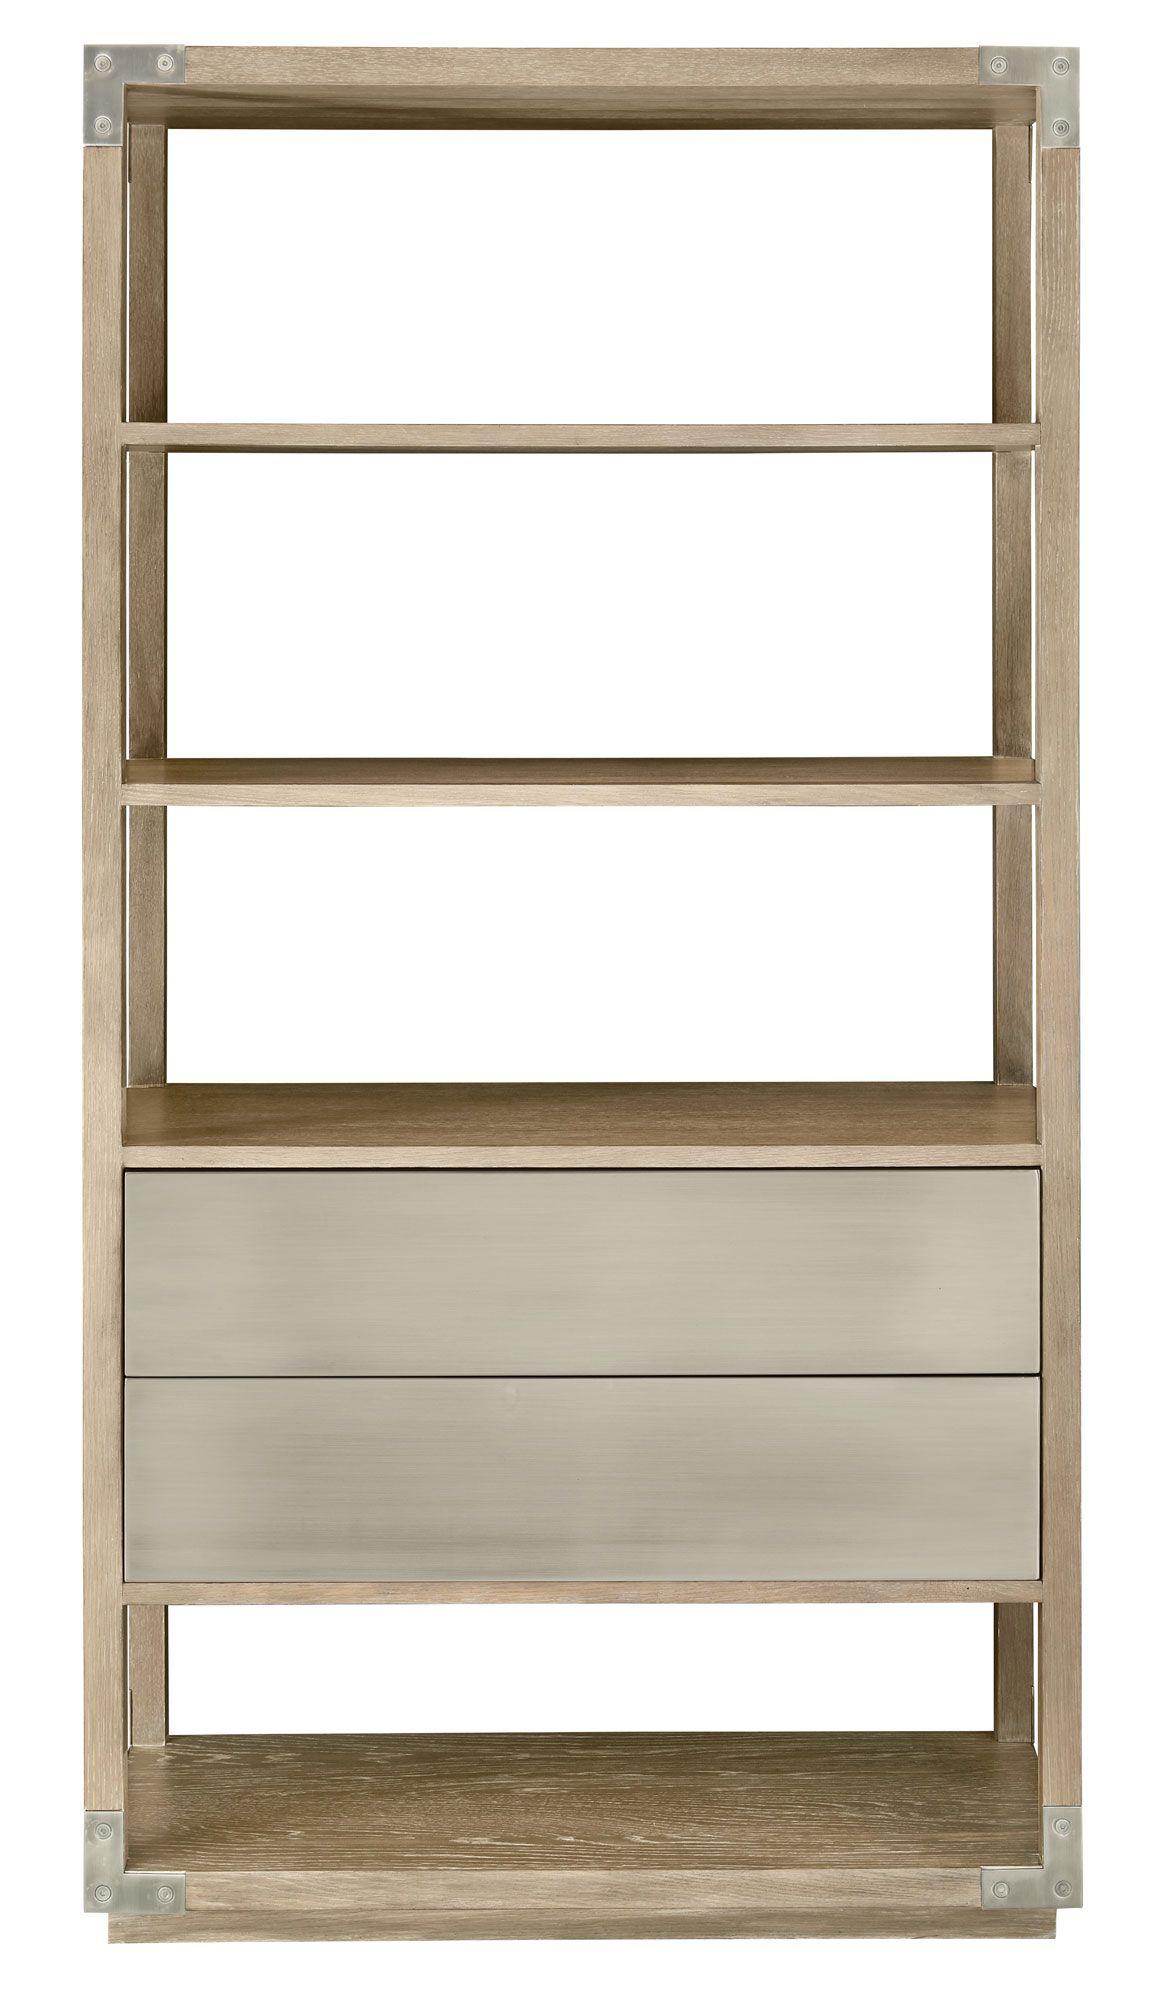 Spaulding Etagere Etagere Bookcase Bookcase Brown Wood